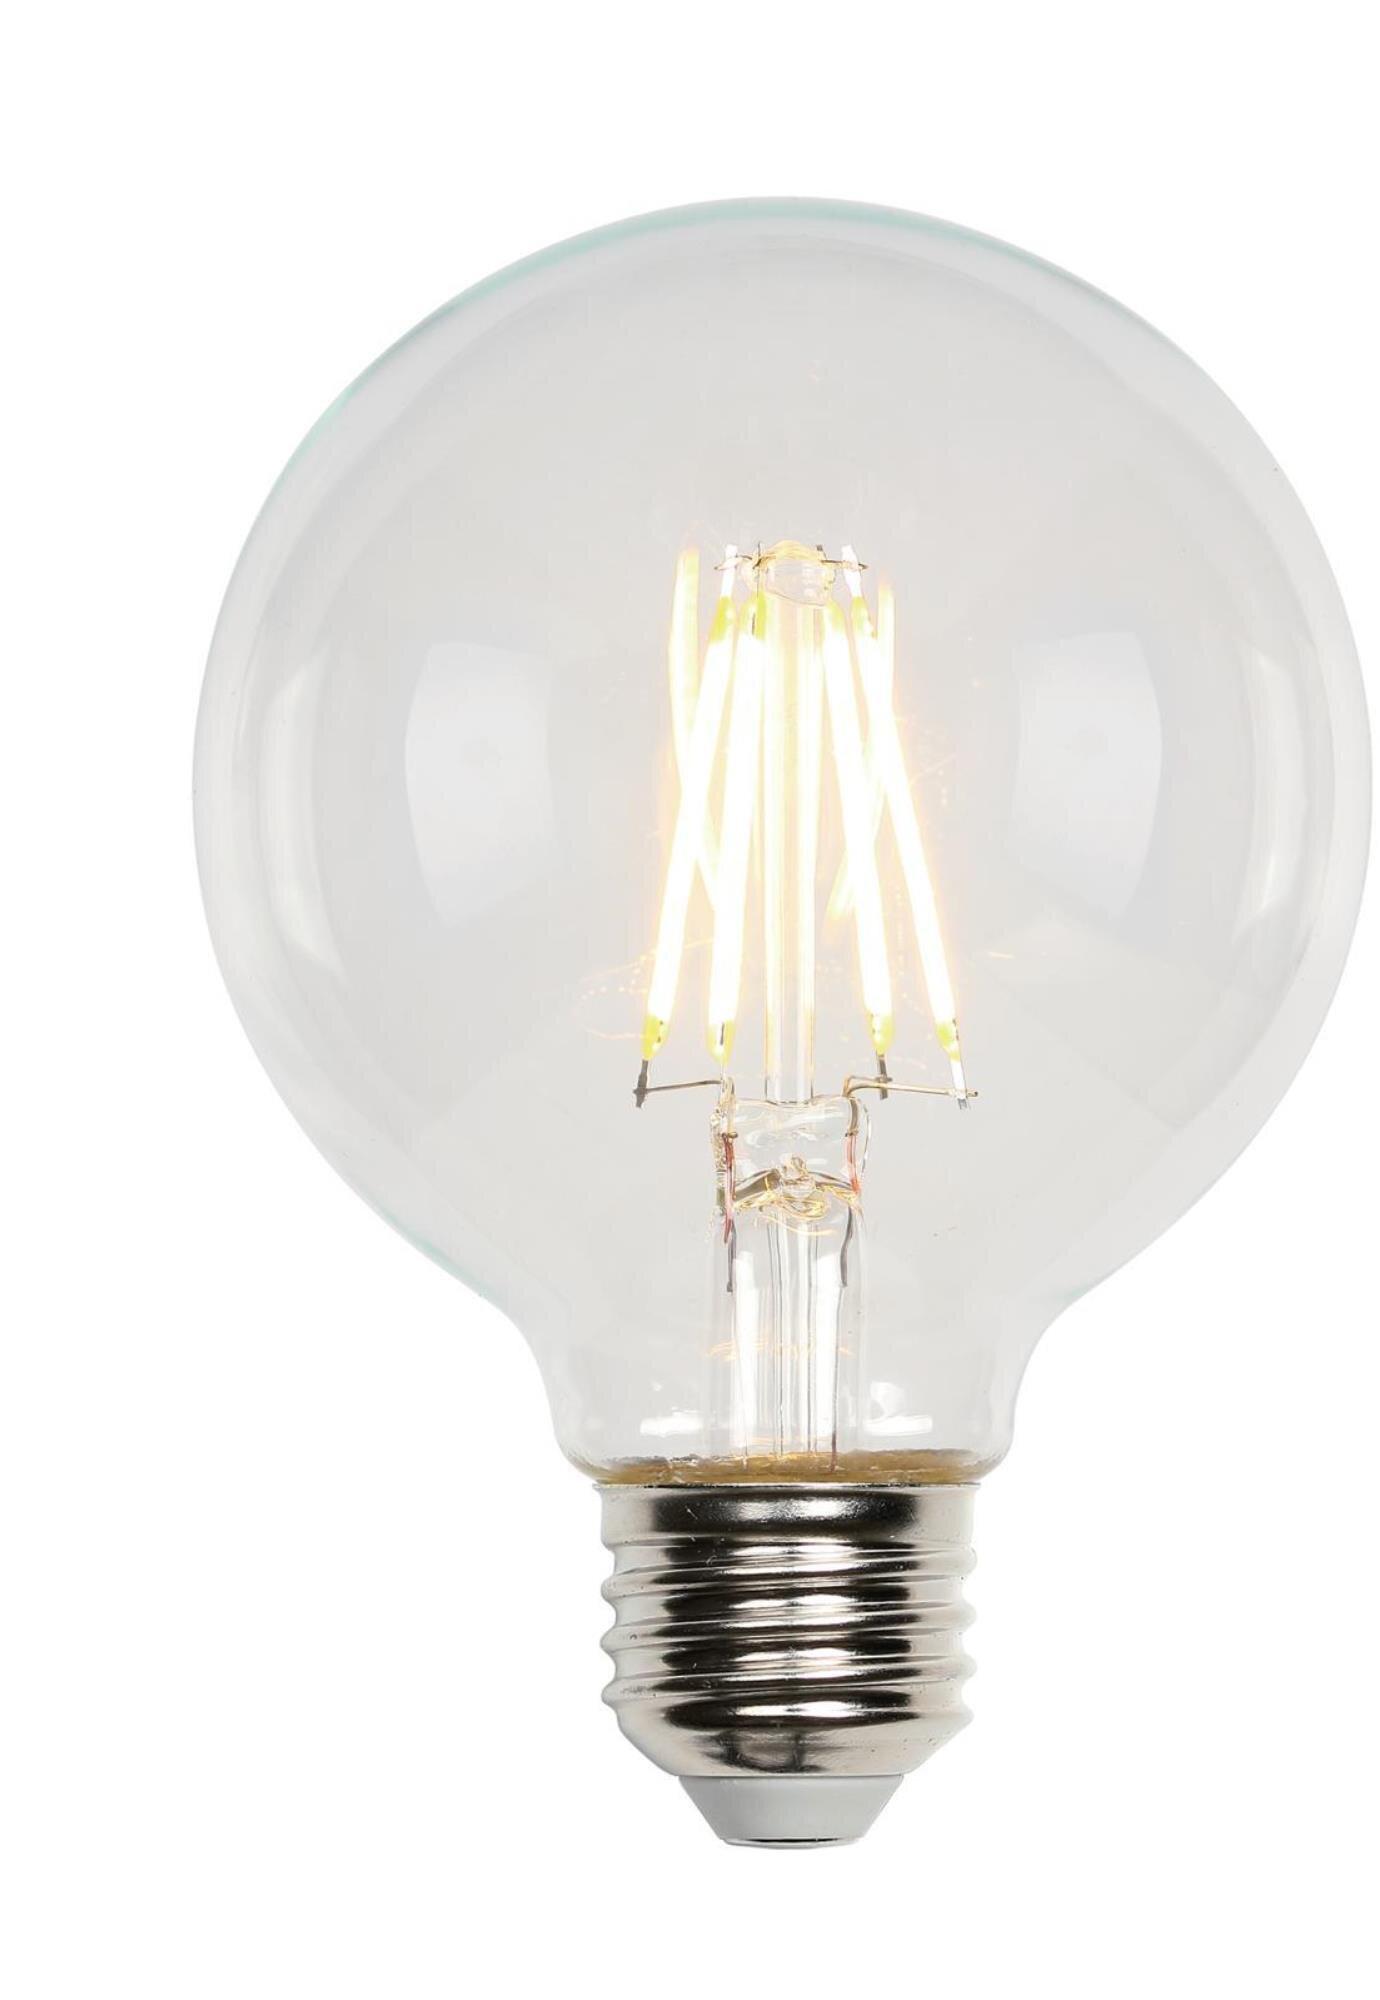 Warm 2700K E26 Medium Base G80 Antique LED Filament Light Bulbs 80W Equivalent 800LM G80-8W-2700K-6 Pack BORT 8W Vintage Globe LED Edison Bulbs G25 Dimmable